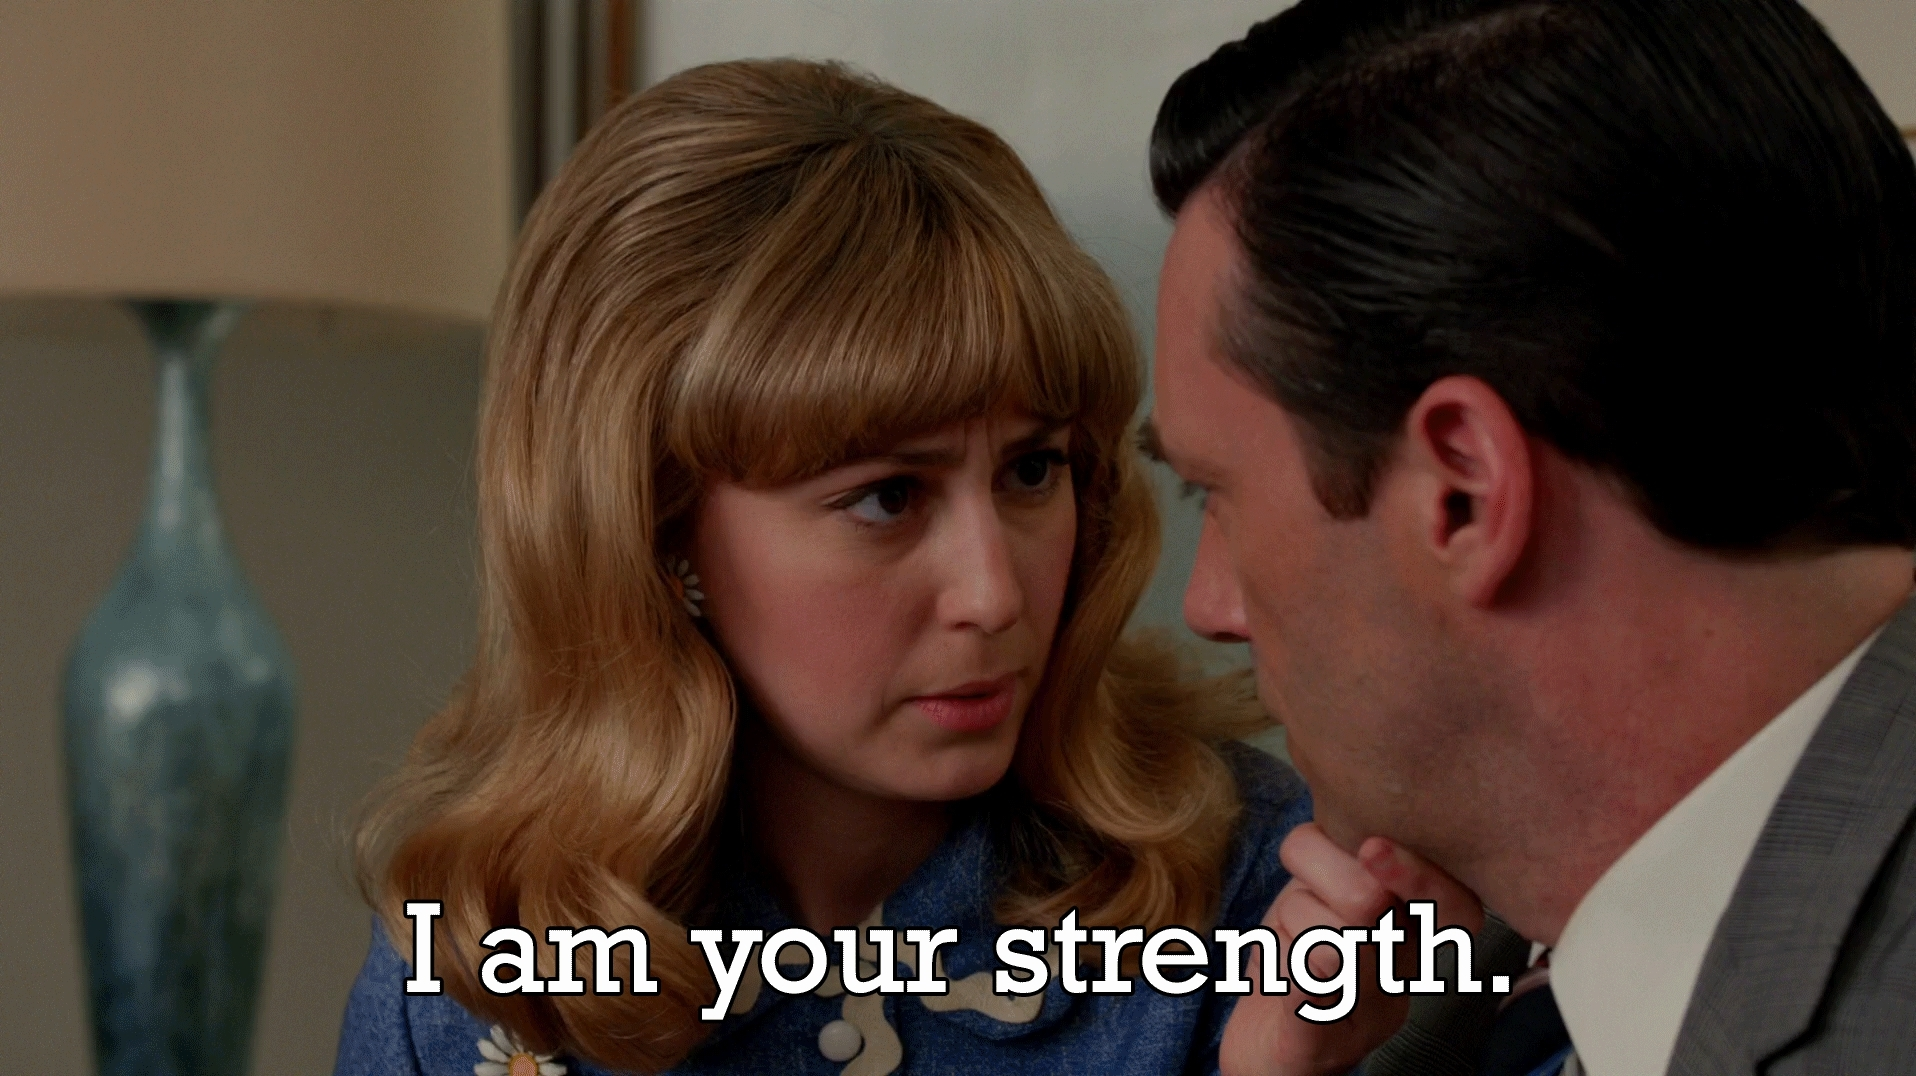 Jon Hamm, MadMen, Strength, madmen, I am your strength GIFs